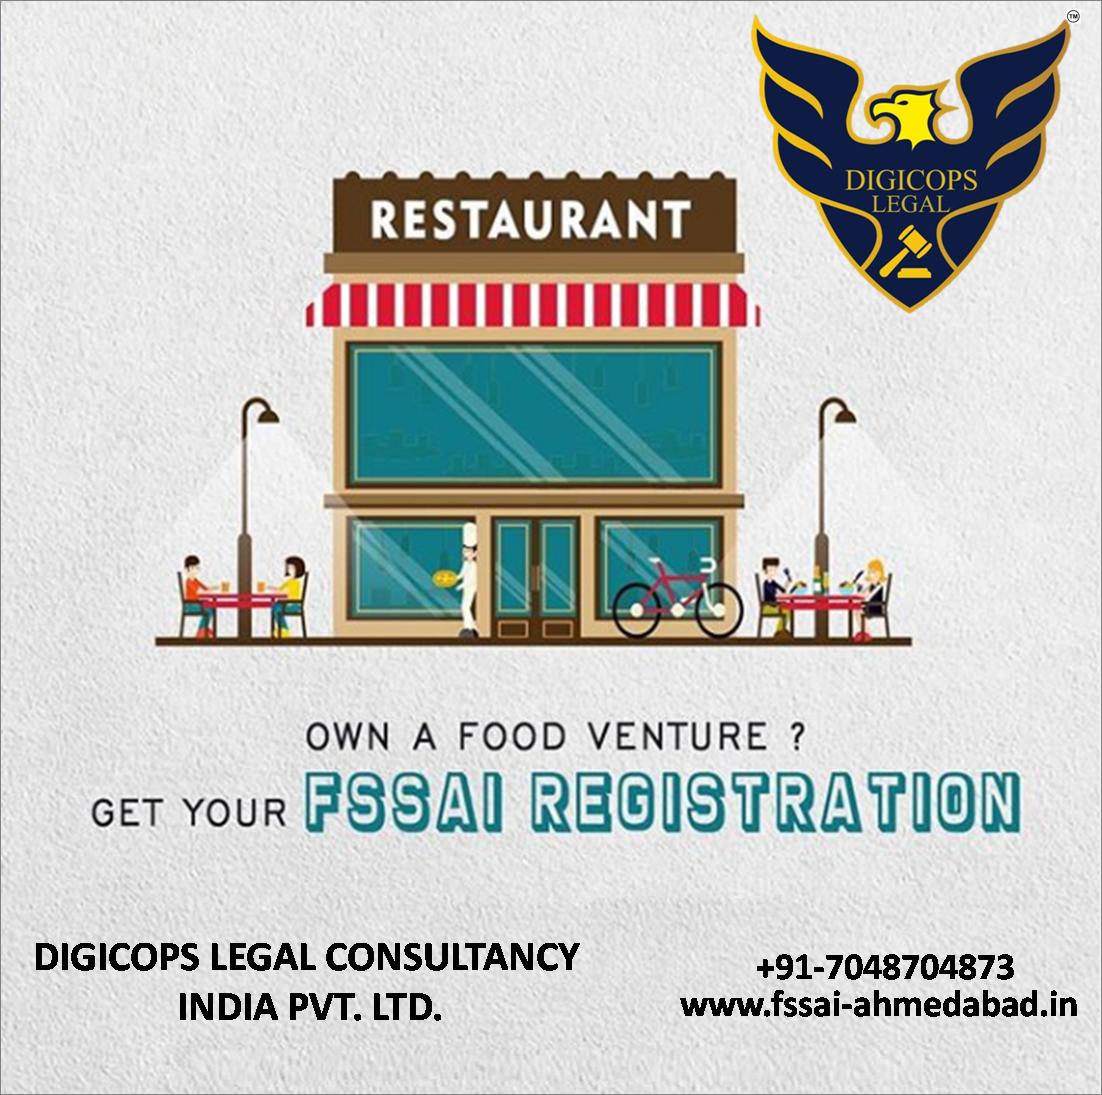 FSSAI consultant Vadodara Food license, Ahmedabad, Food